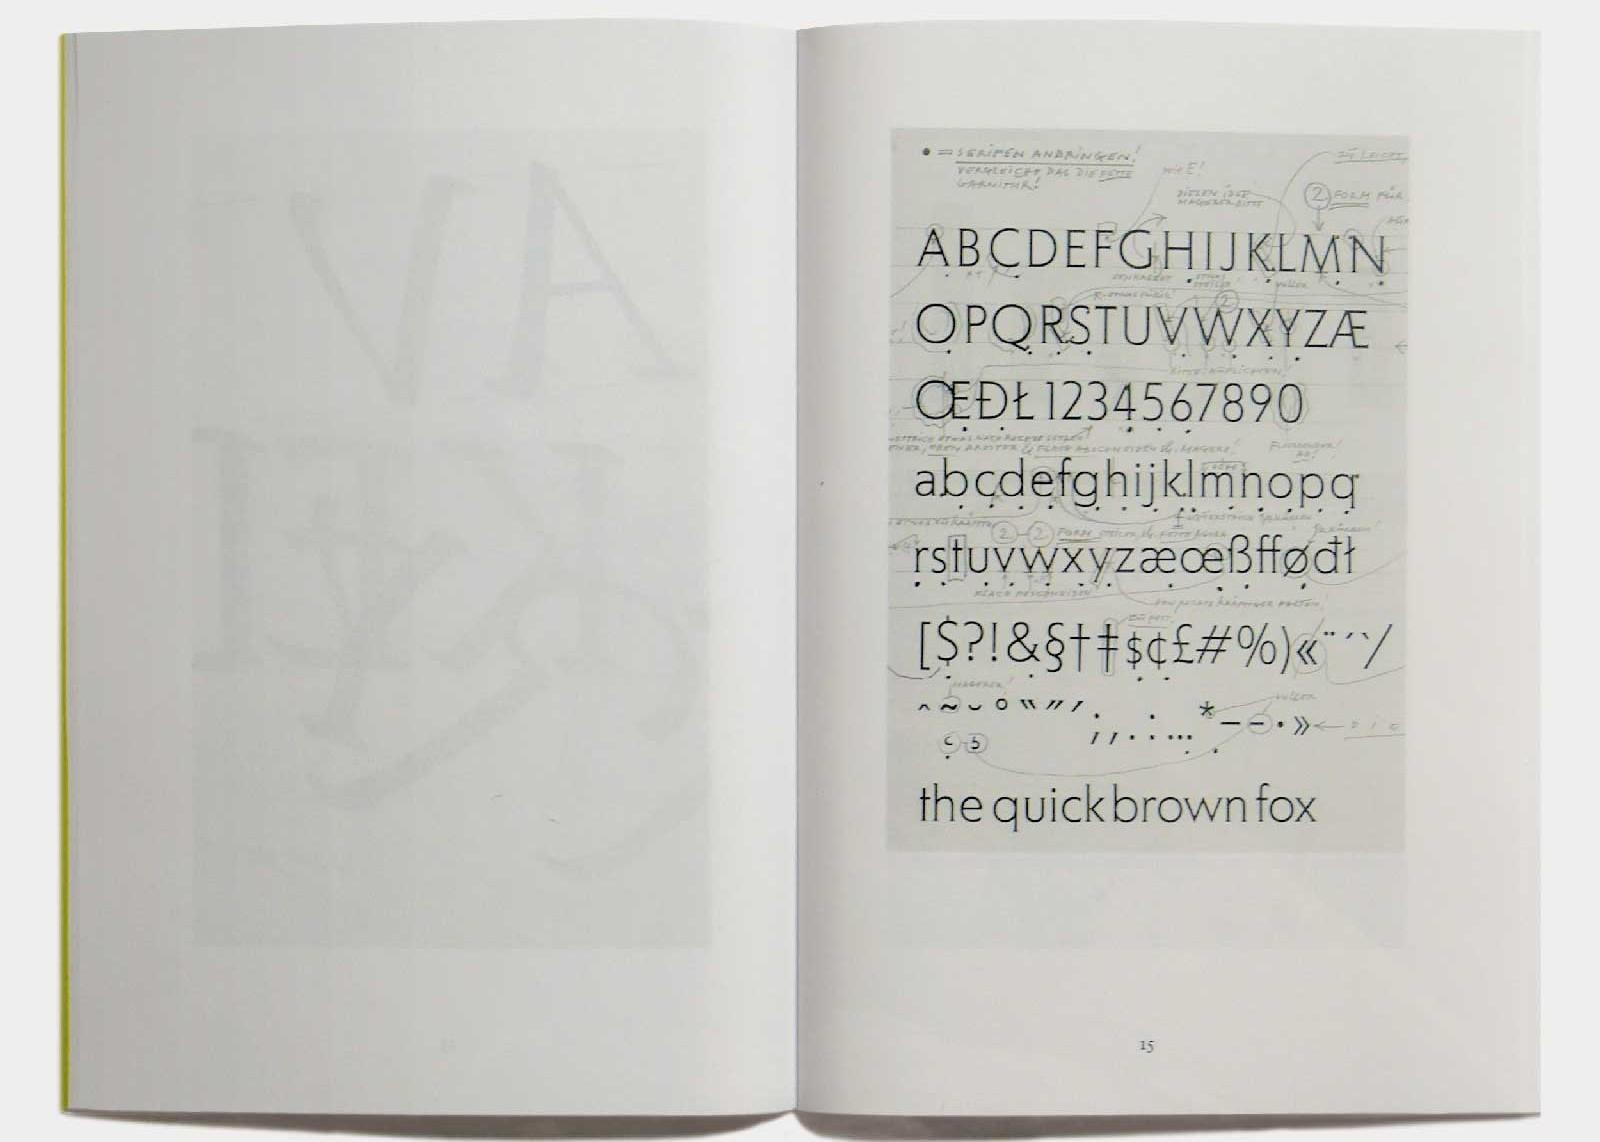 Page 15 — Caractère Agora (1990, Berthold), corrections manuscrites de Günter Gerhard Lange.